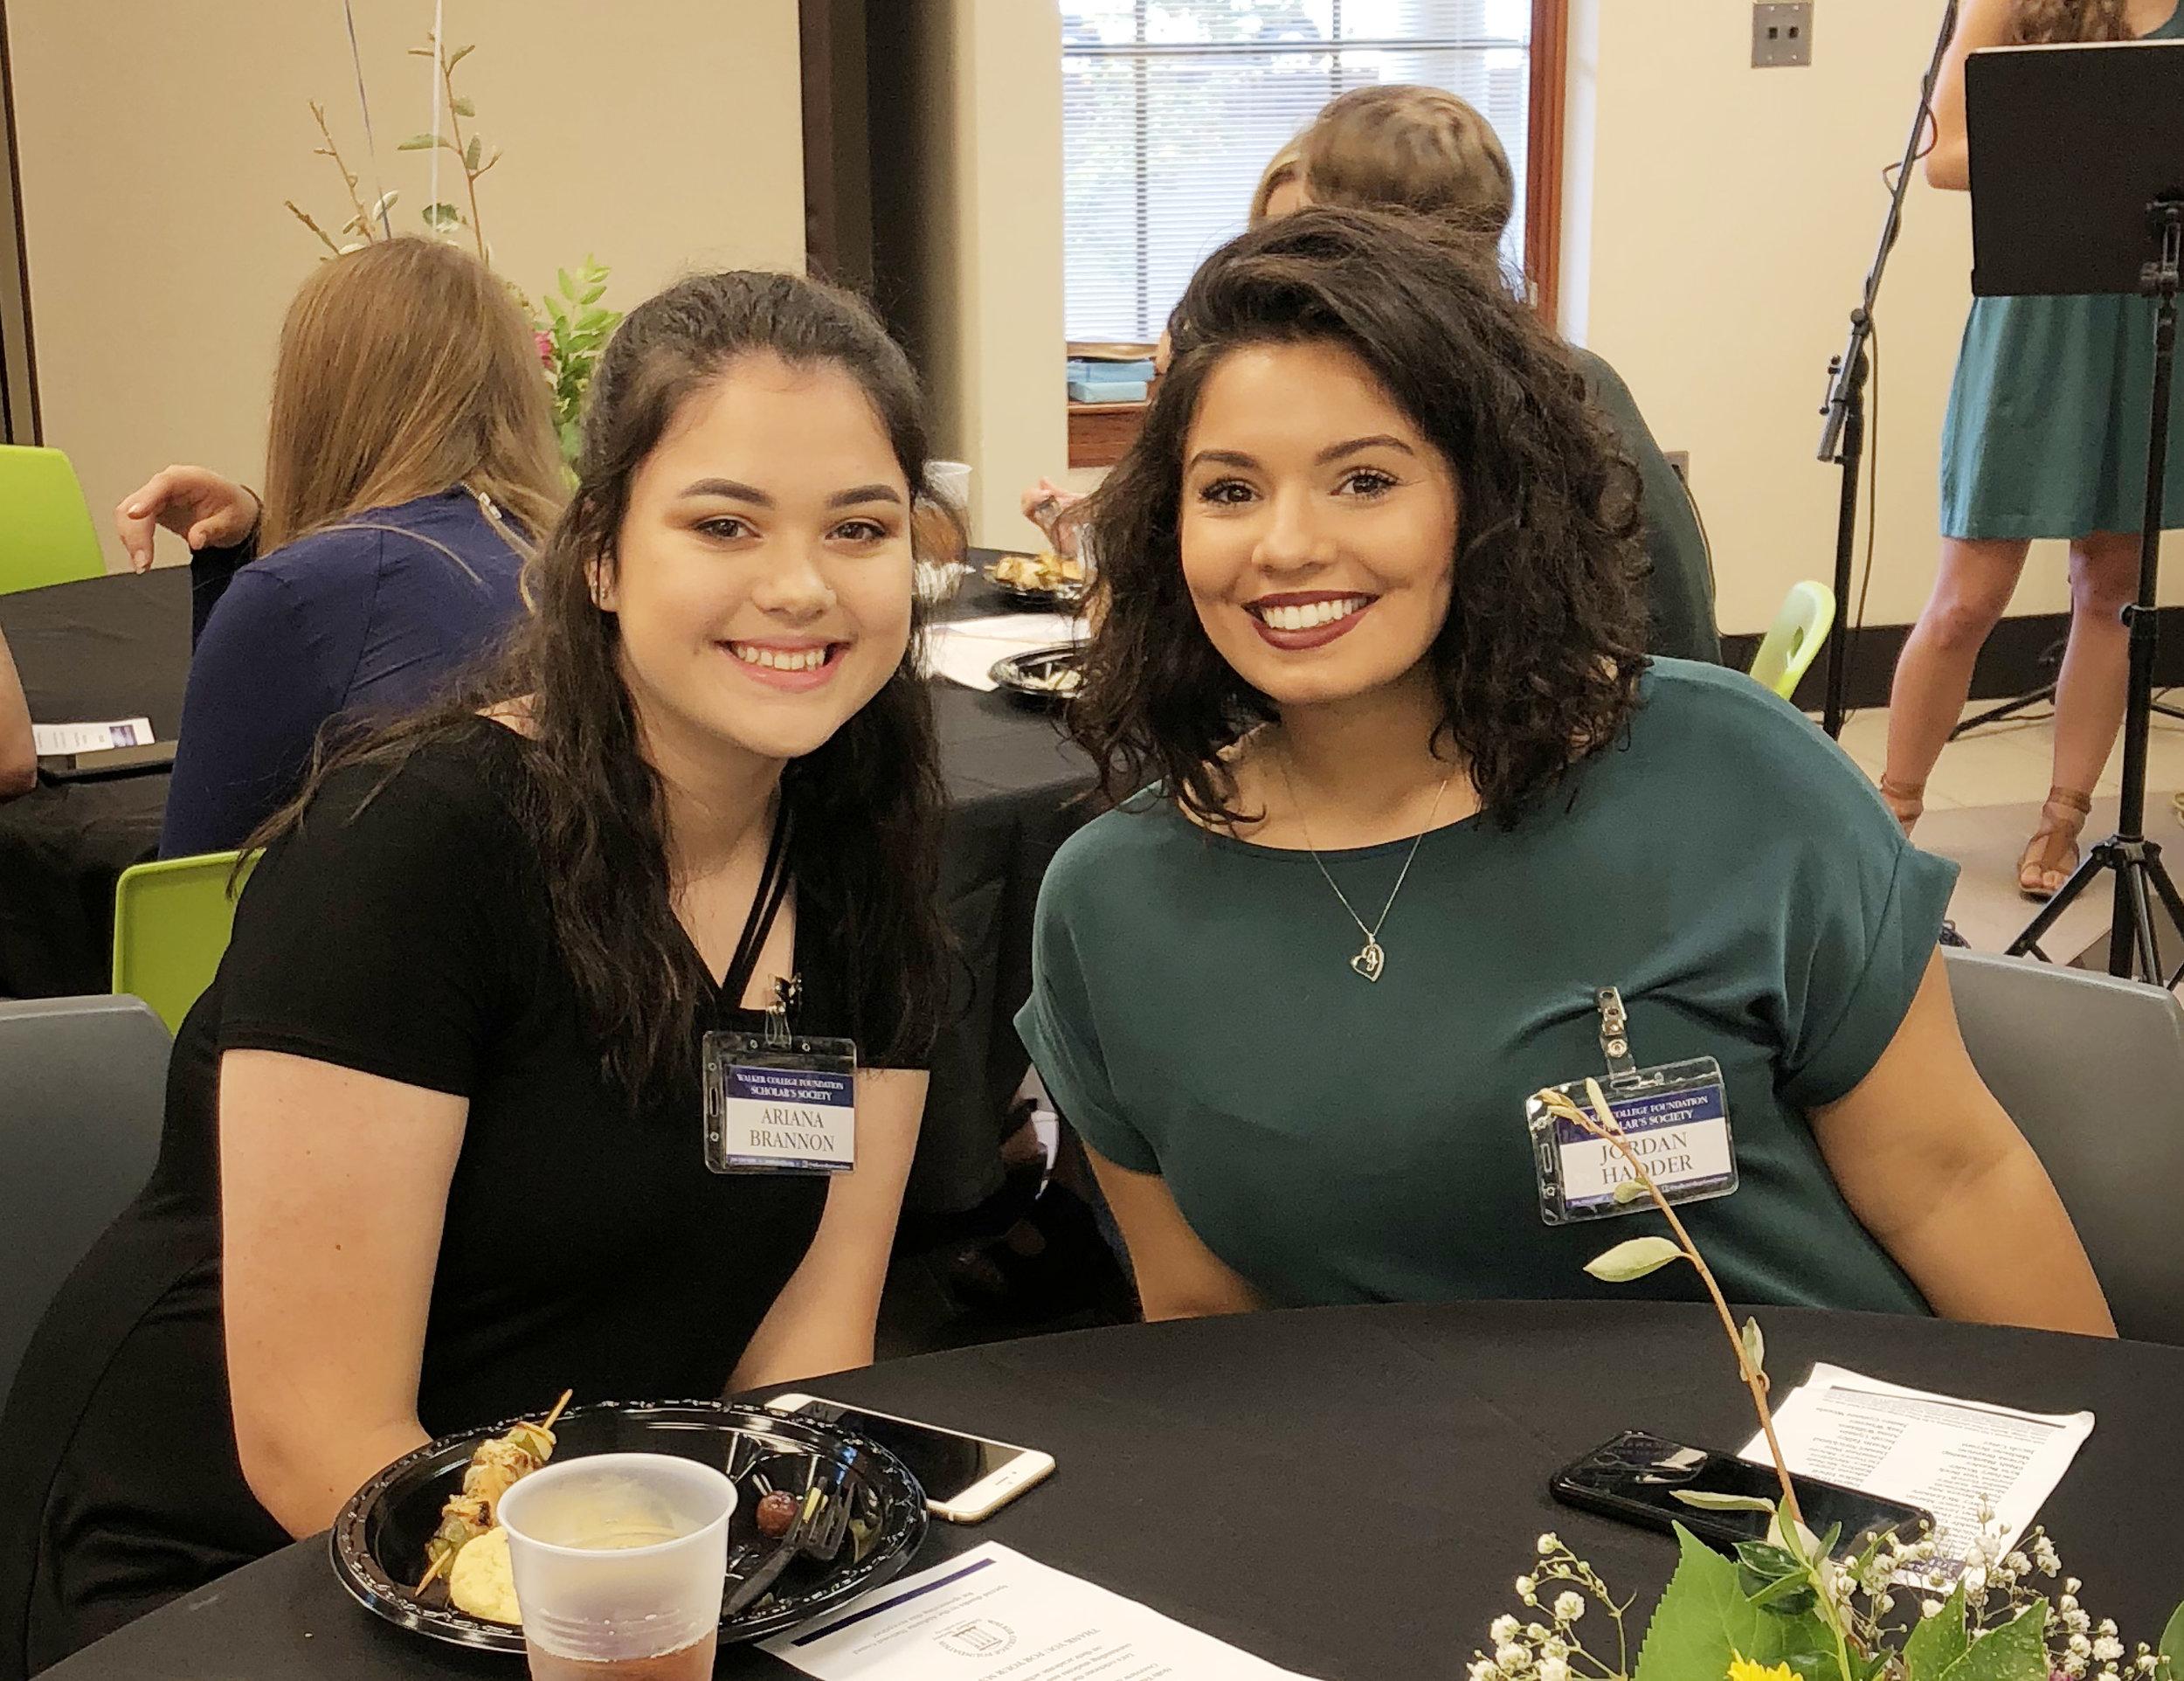 Arianna and Jordan at scholarship reception.